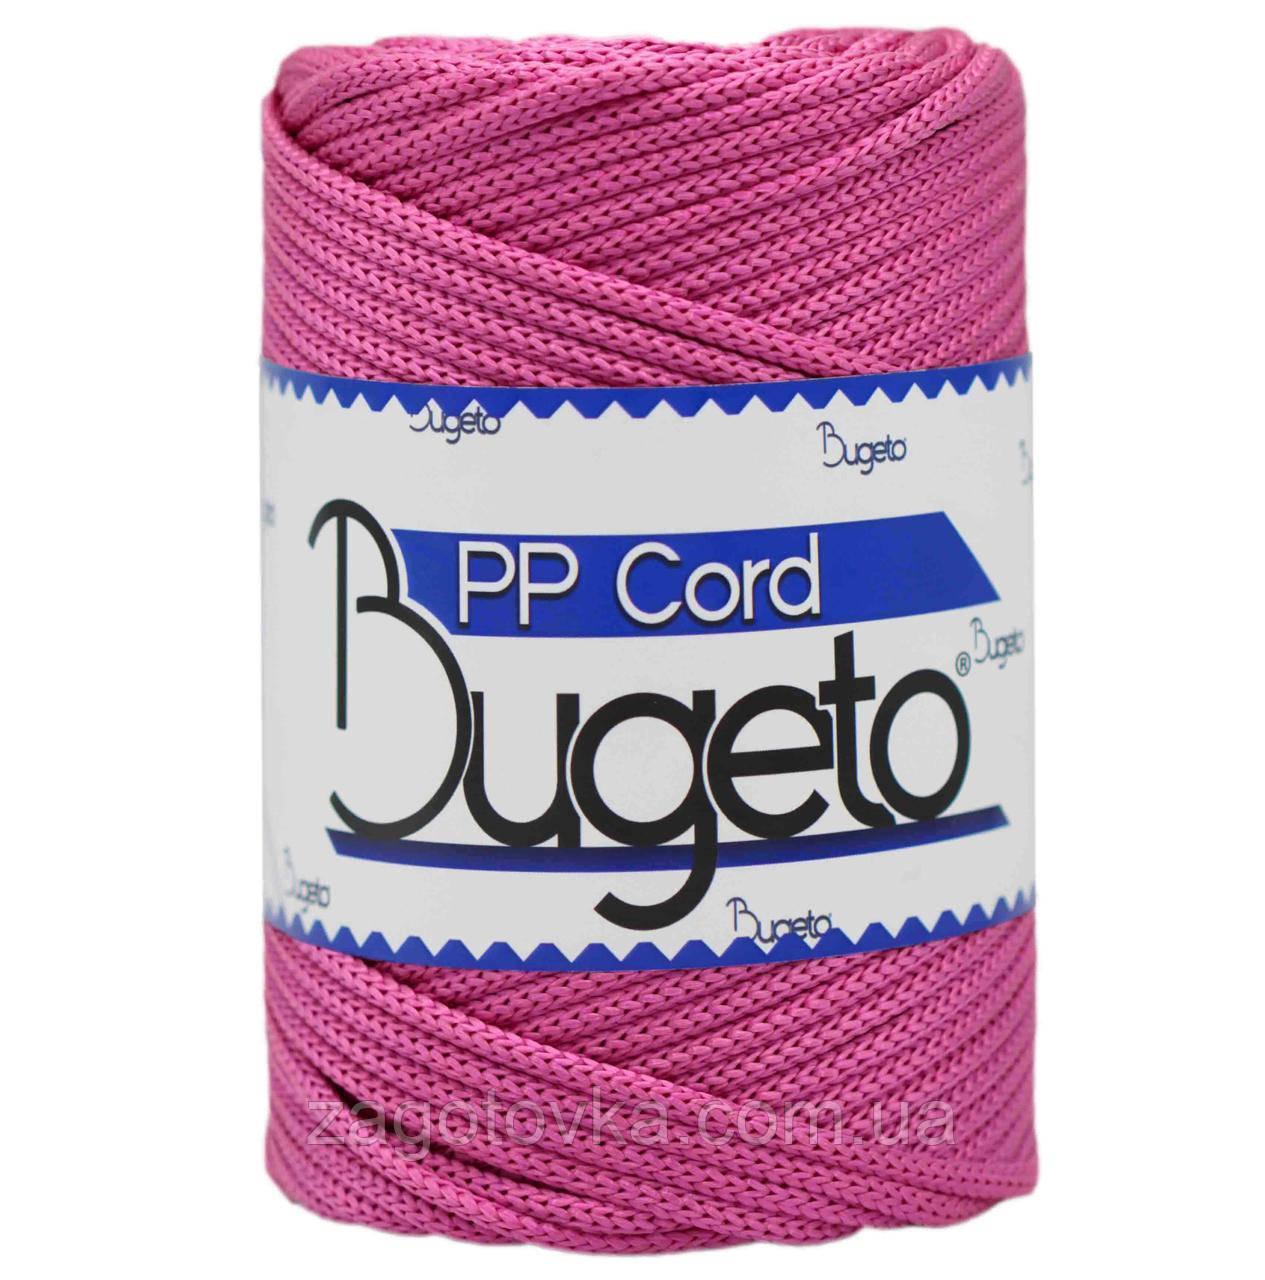 Полипропиленовый шнур Bugeto PP Cord 5mm, цвет Фуксия